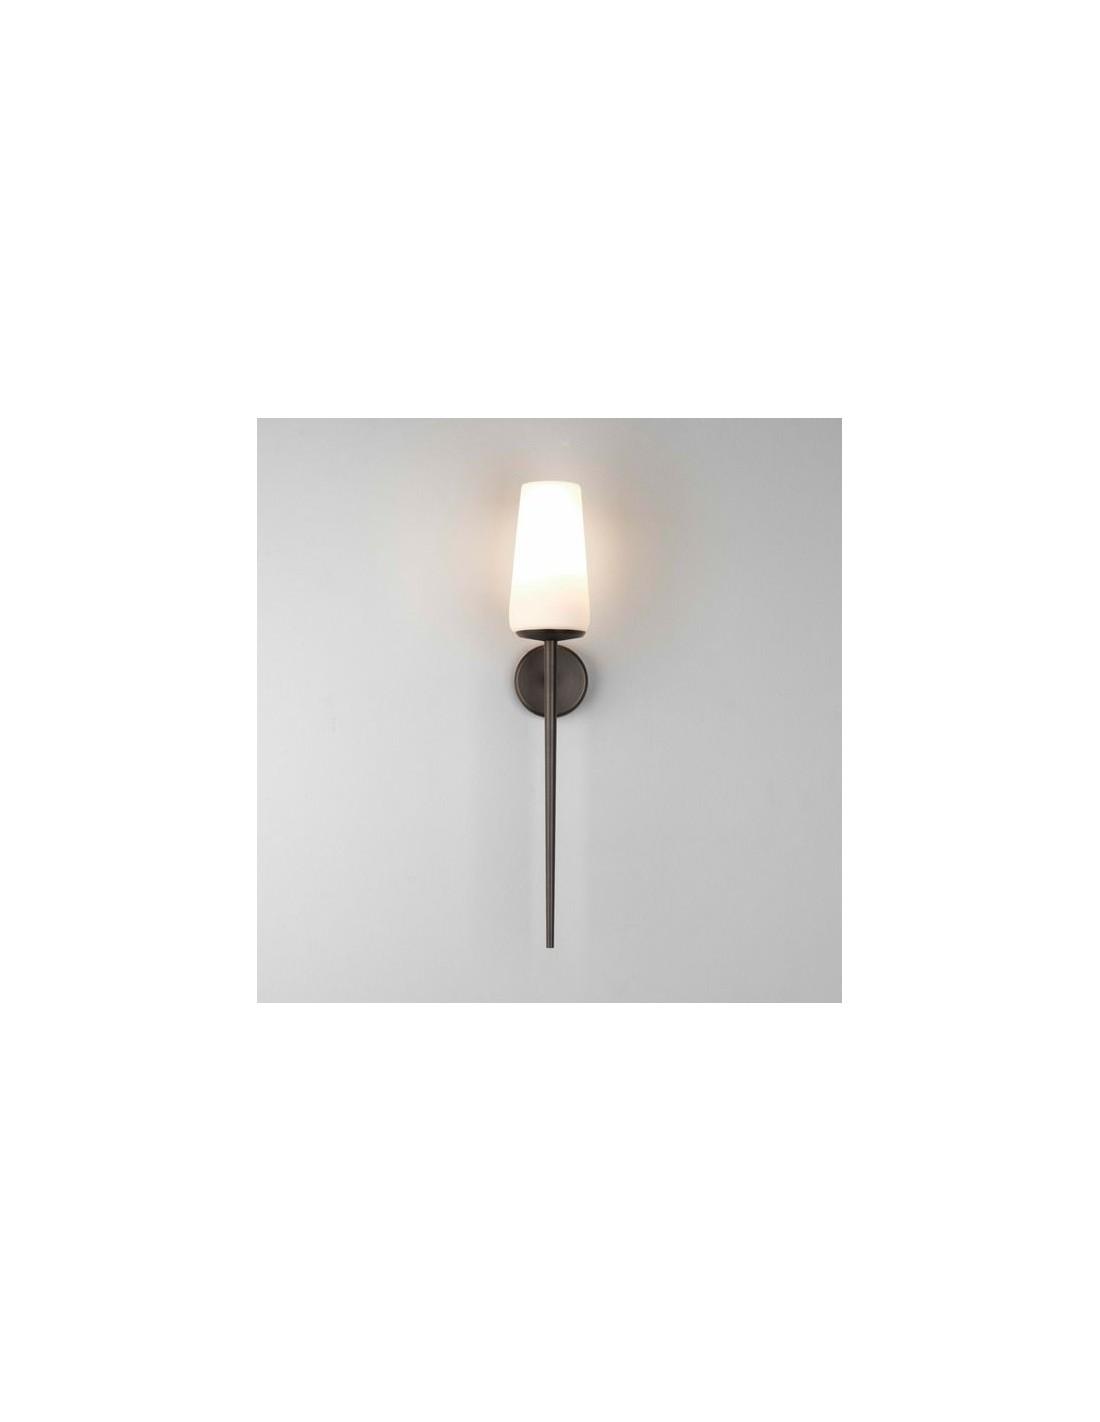 applique sdb deauville bronze de face astro lighting. Black Bedroom Furniture Sets. Home Design Ideas